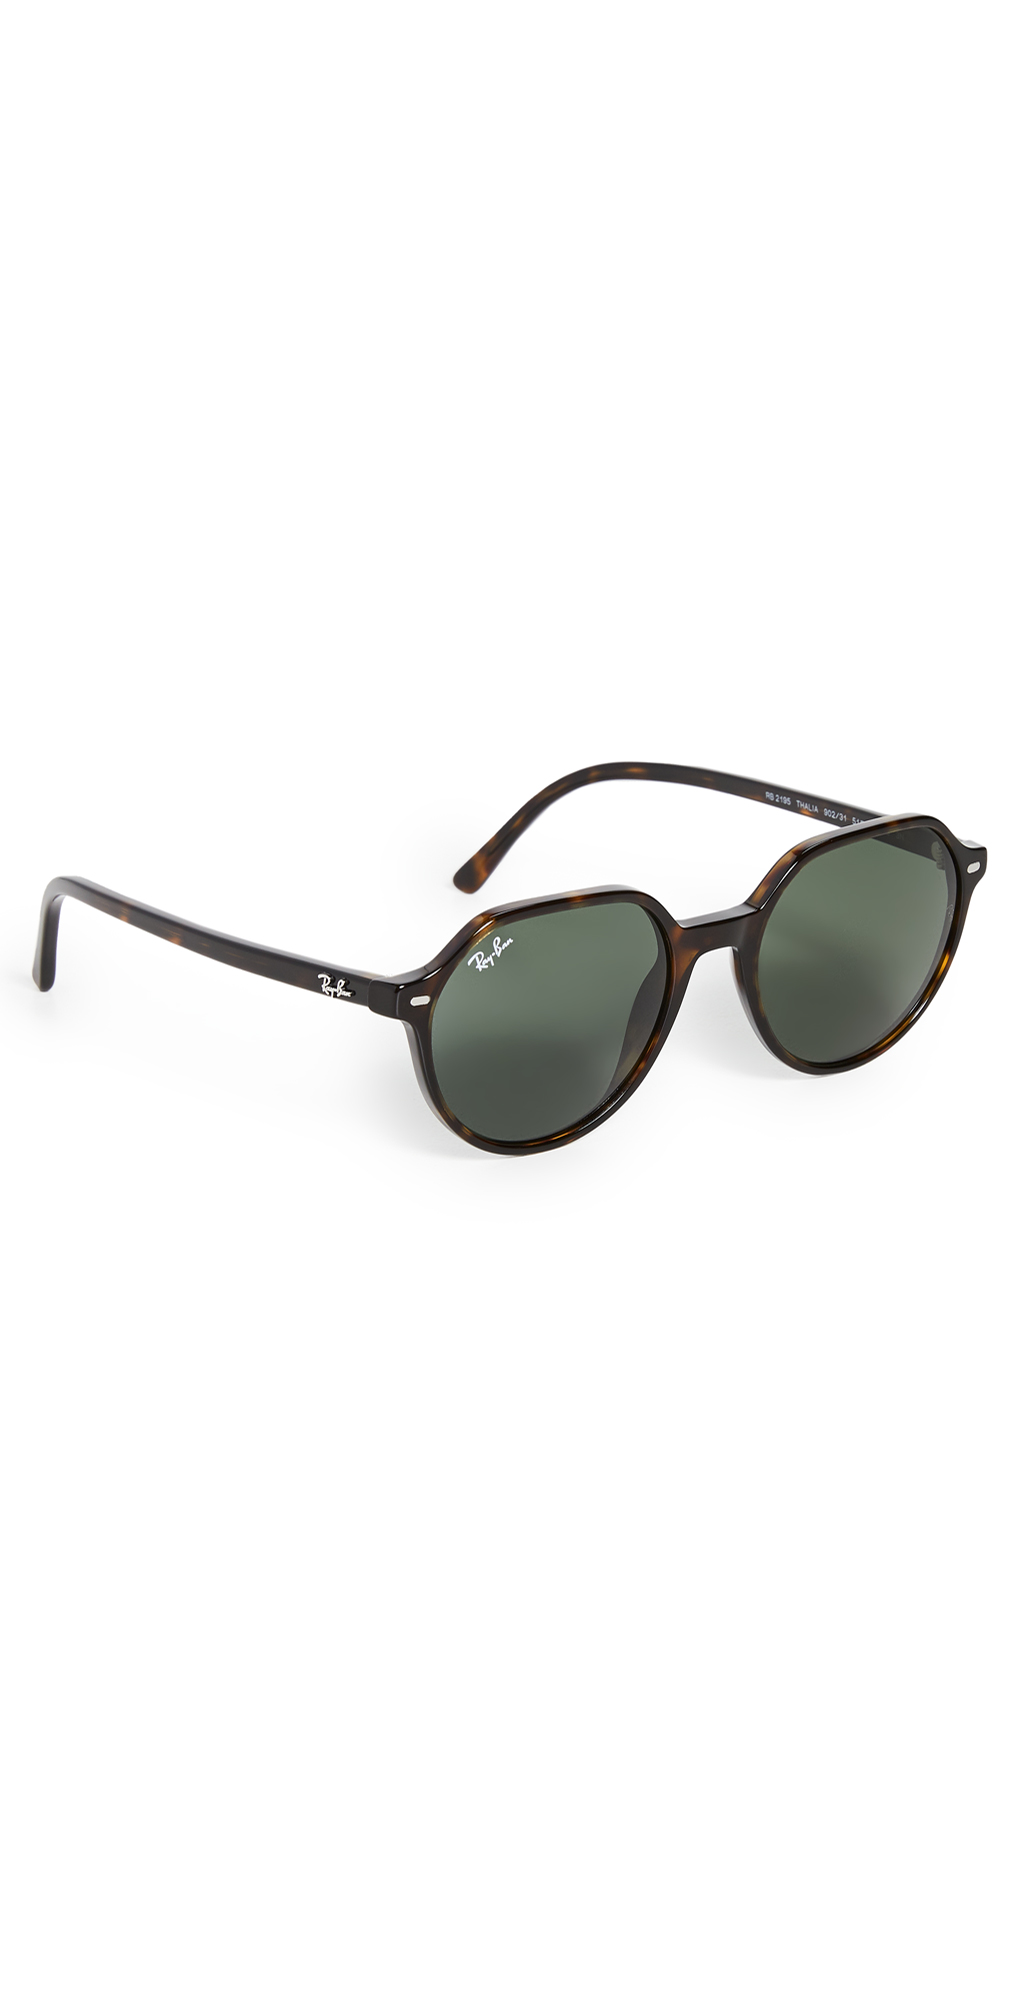 Ray Ban Sunglasses THALIA SUNGLASSES